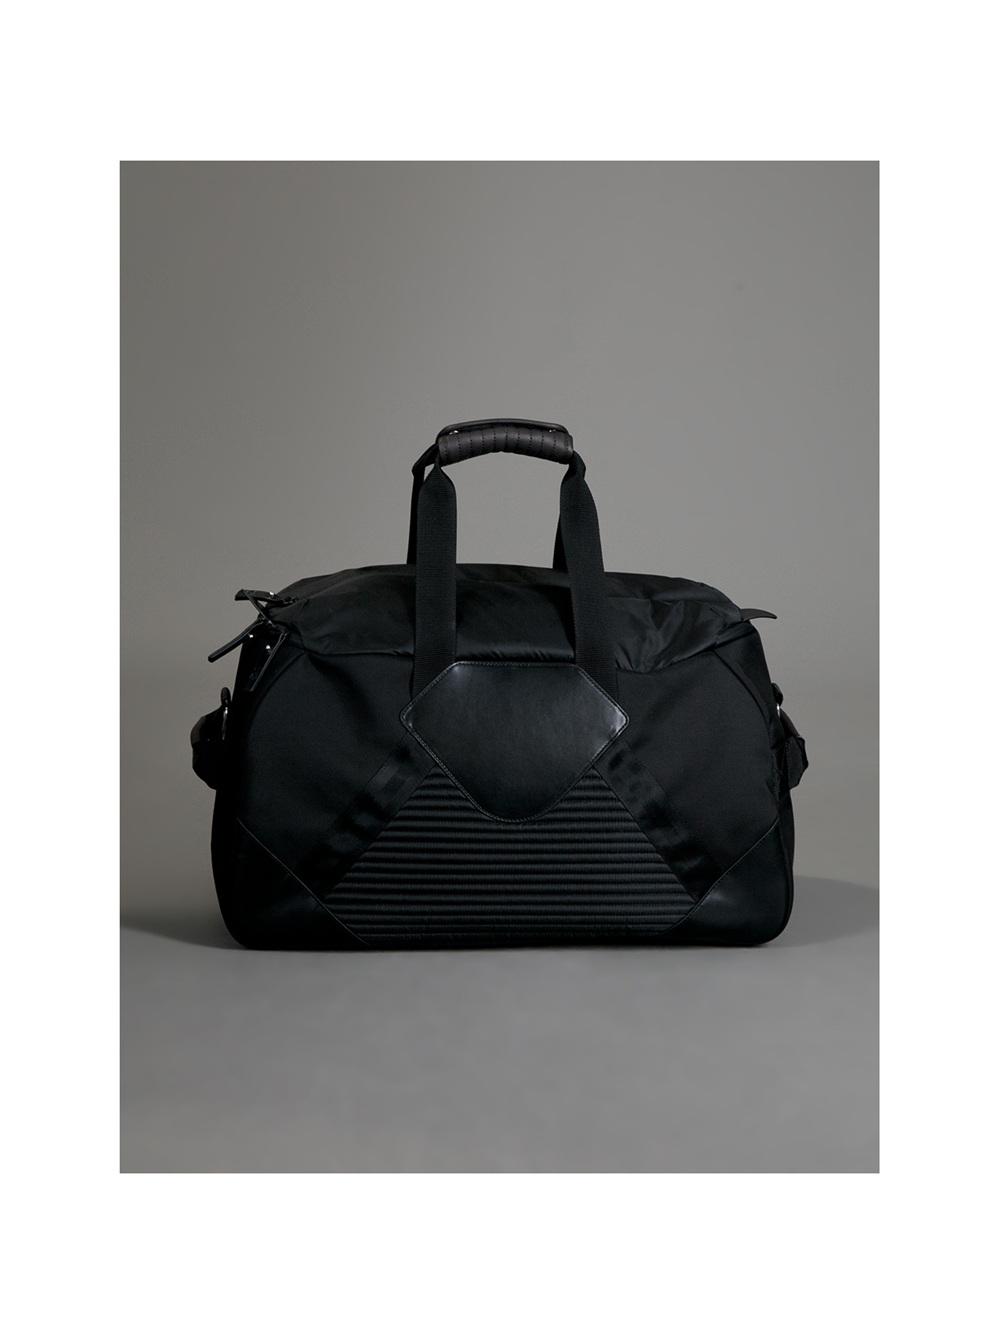 284add1108a Lyst - Y-3 Weekend Bag in Black for Men